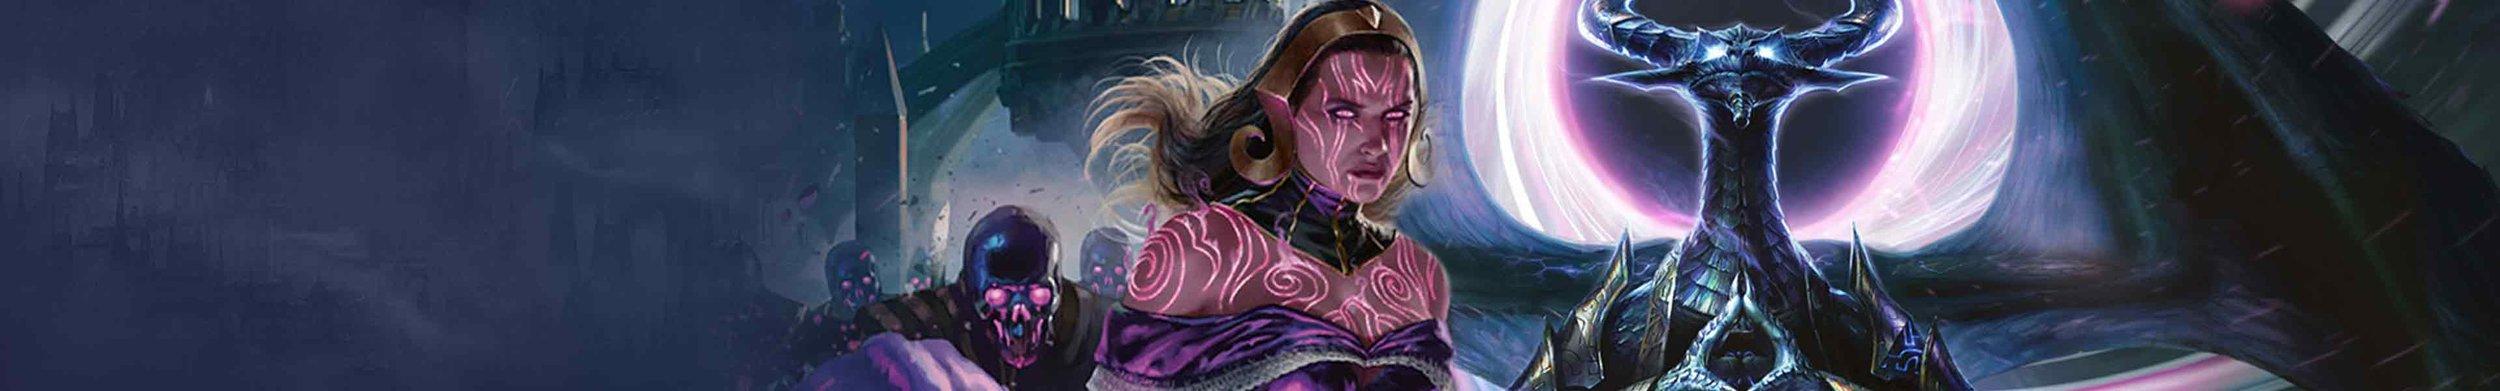 magic_war_of_the_spark-banner-02-2x..jpg